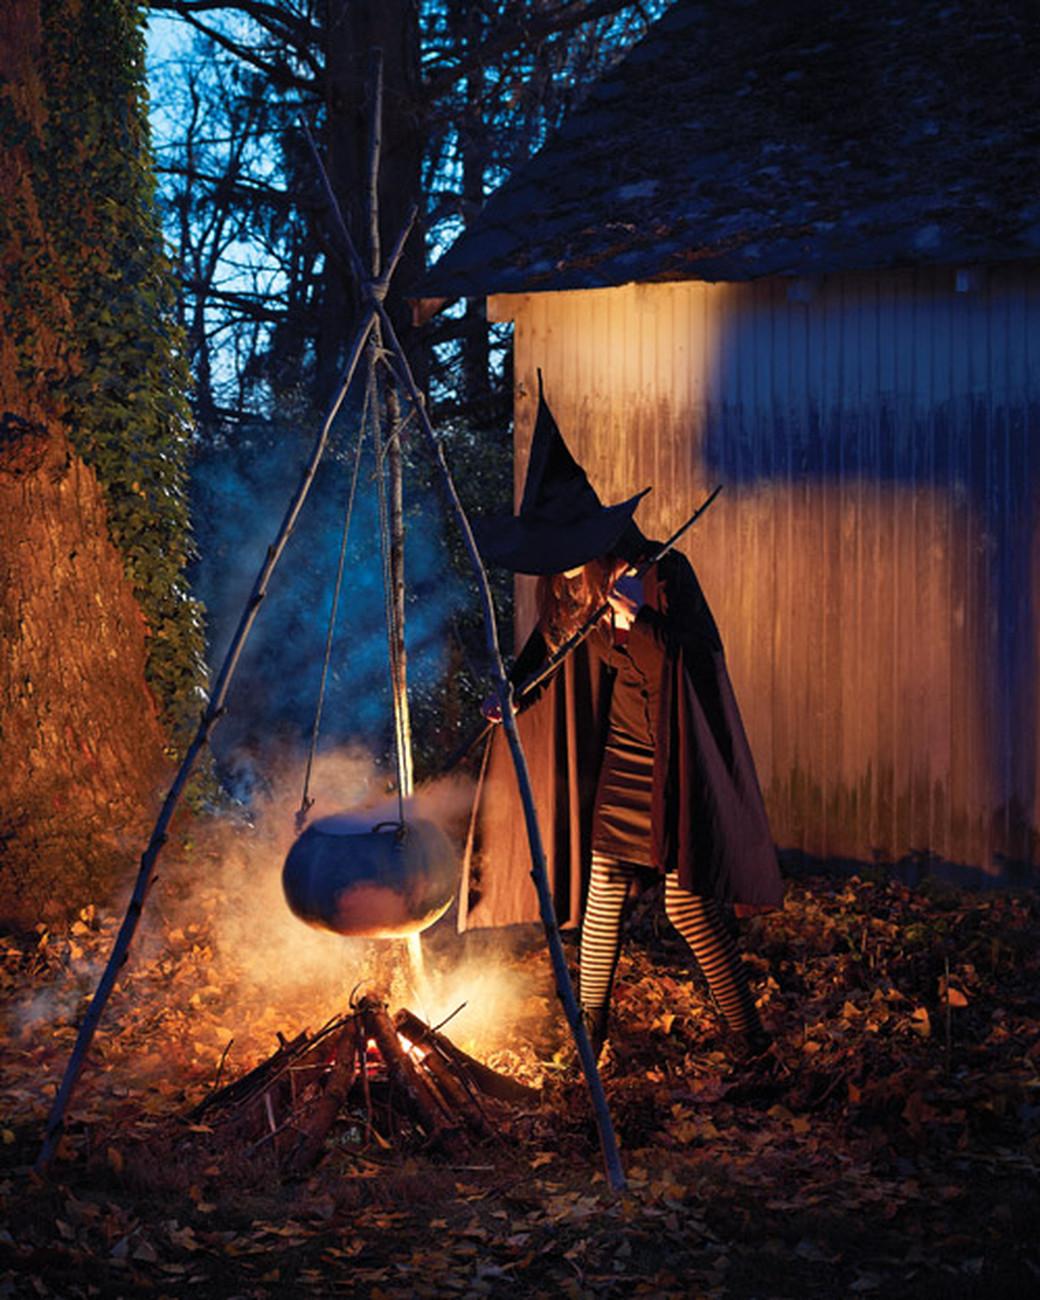 Halloween Decoration Outdoor  23 Festive Halloween Witch Decor DIY Ideas